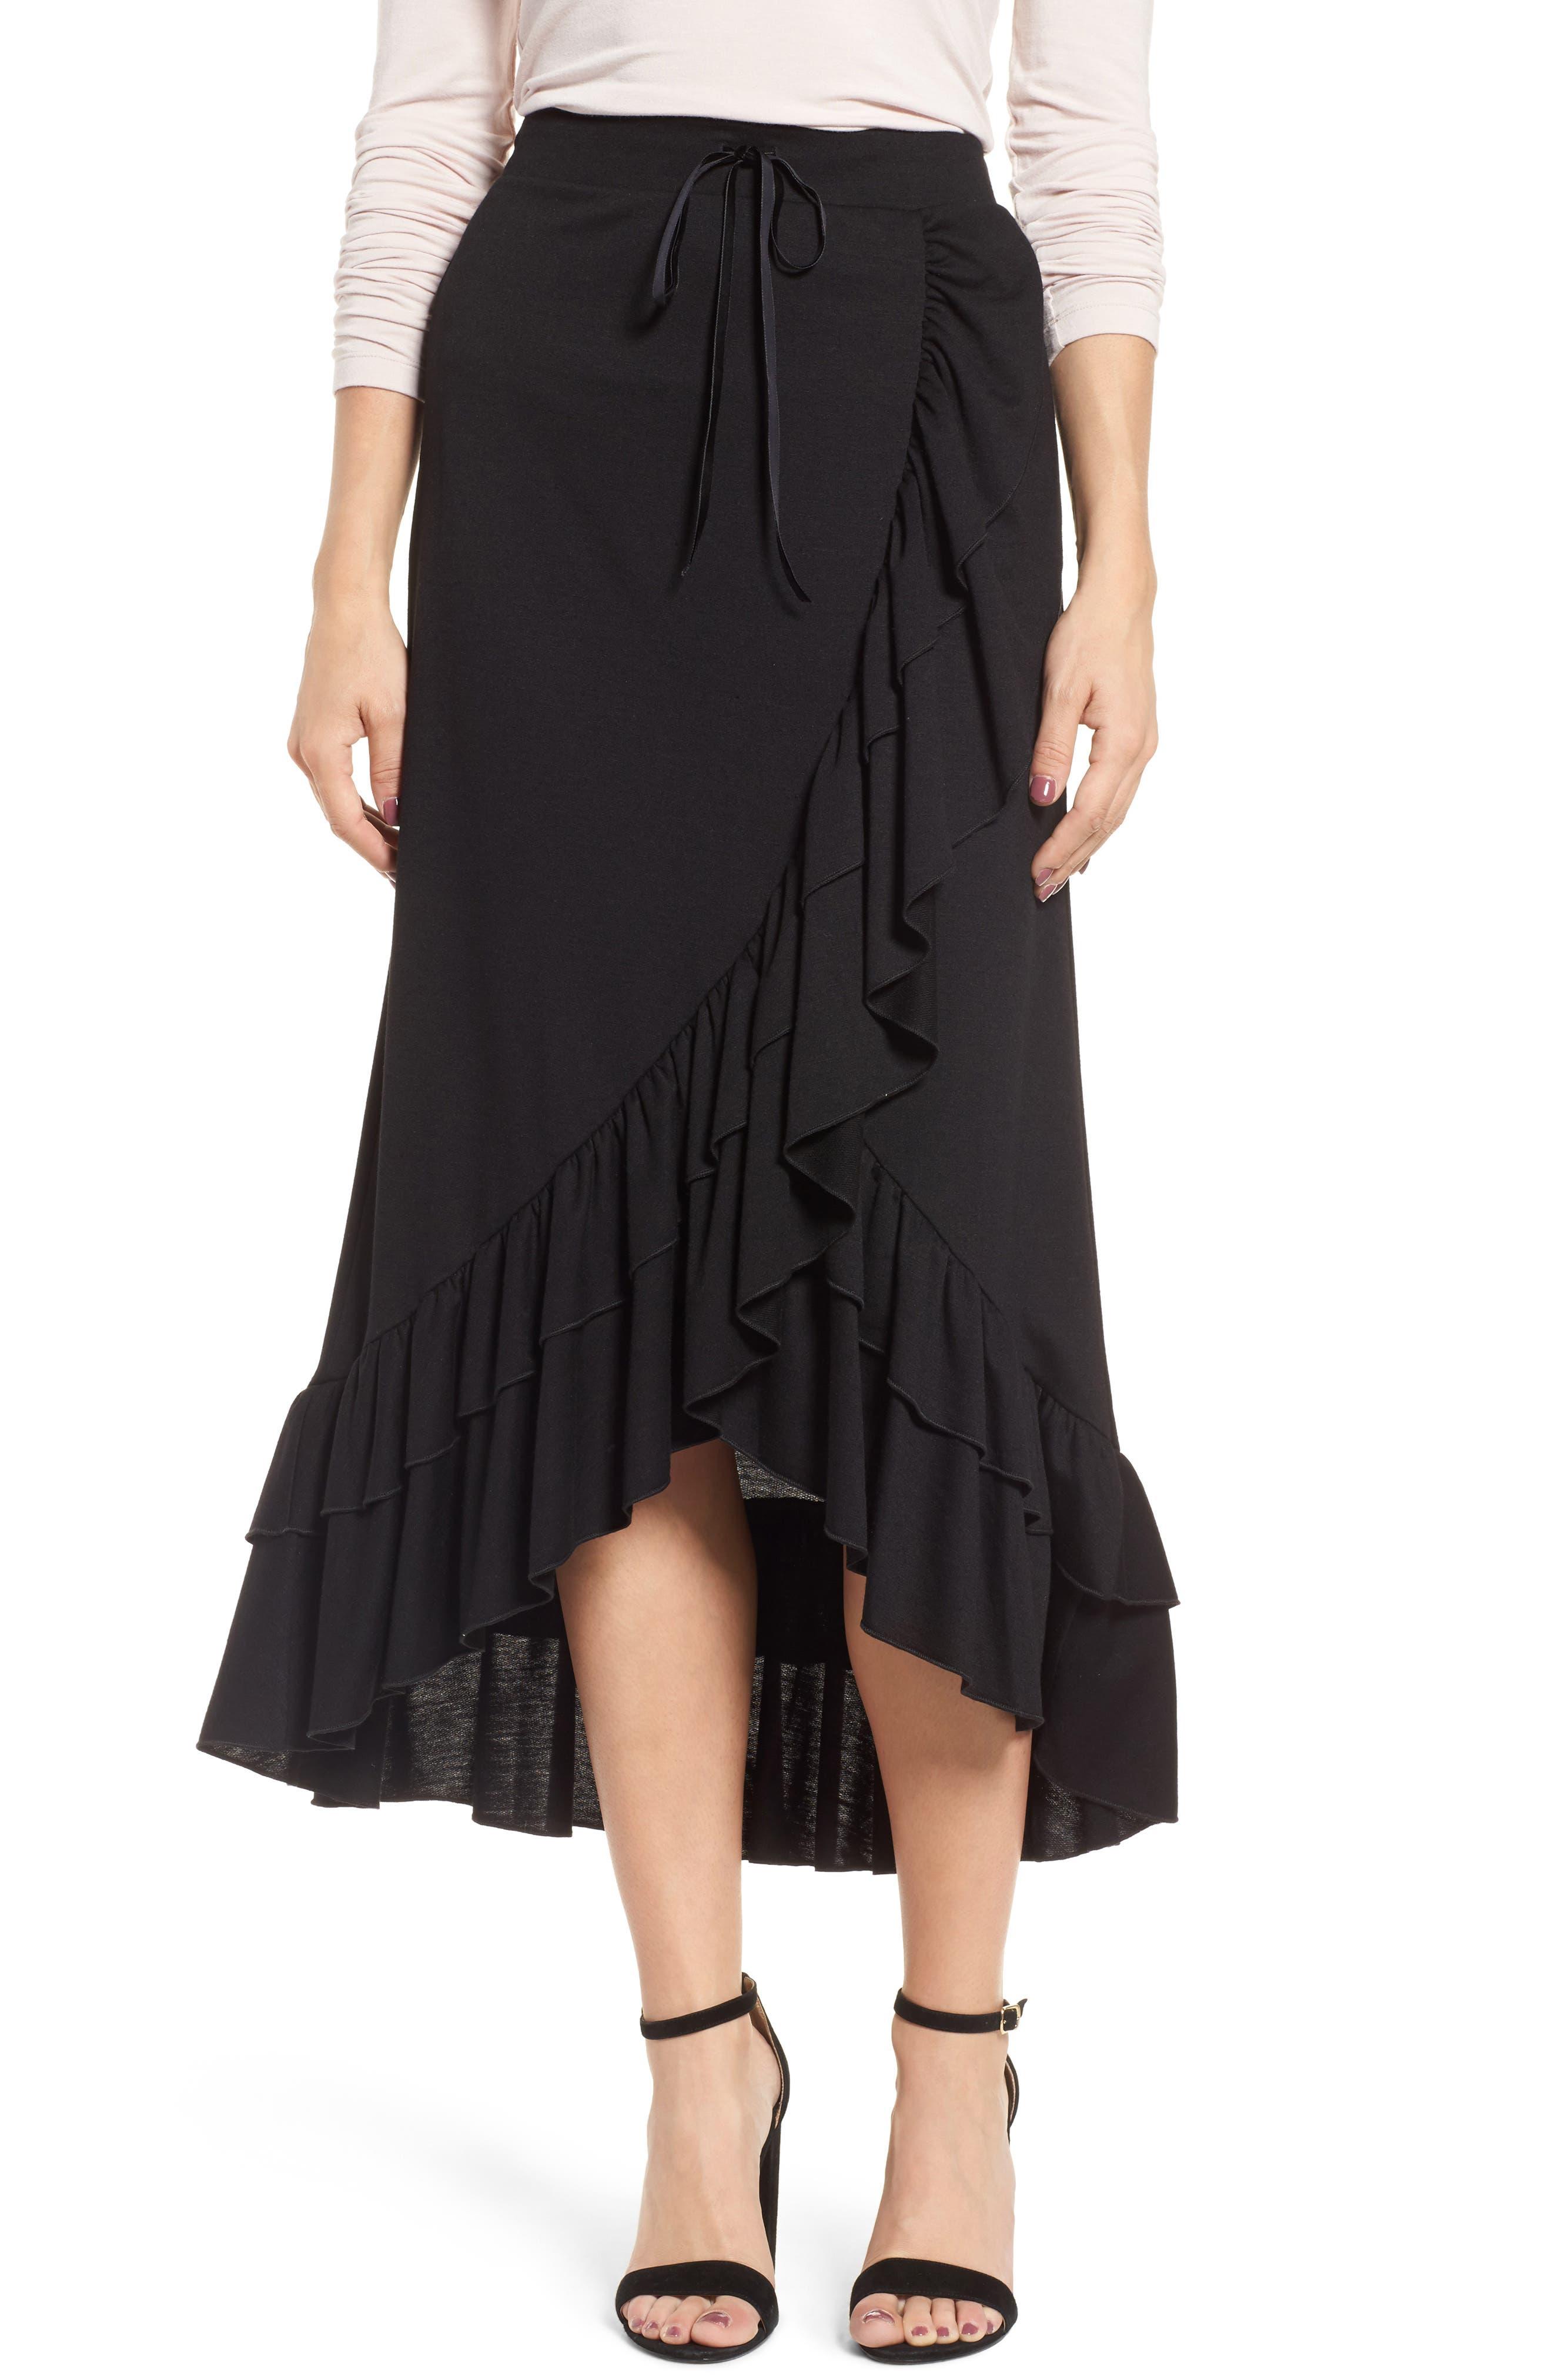 Alternate Image 1 Selected - Halogen® Ruffle Midi Skirt